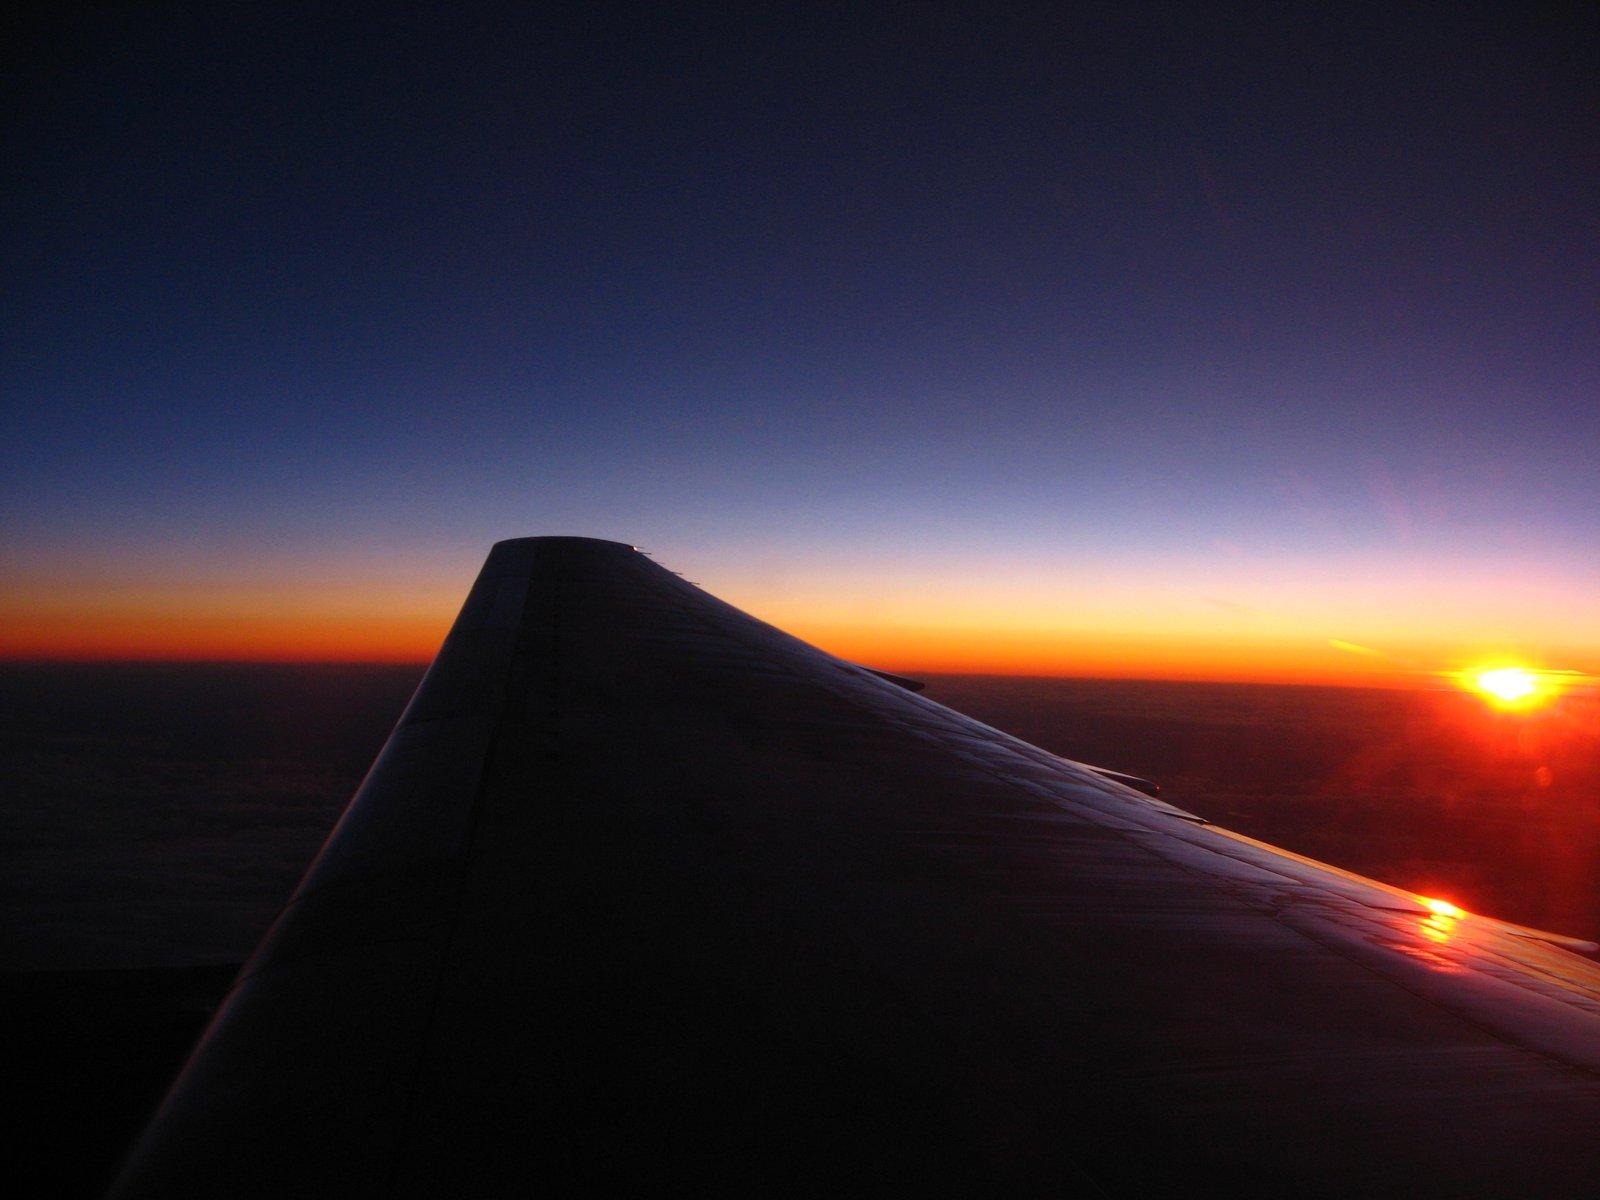 Sunset on Airplane